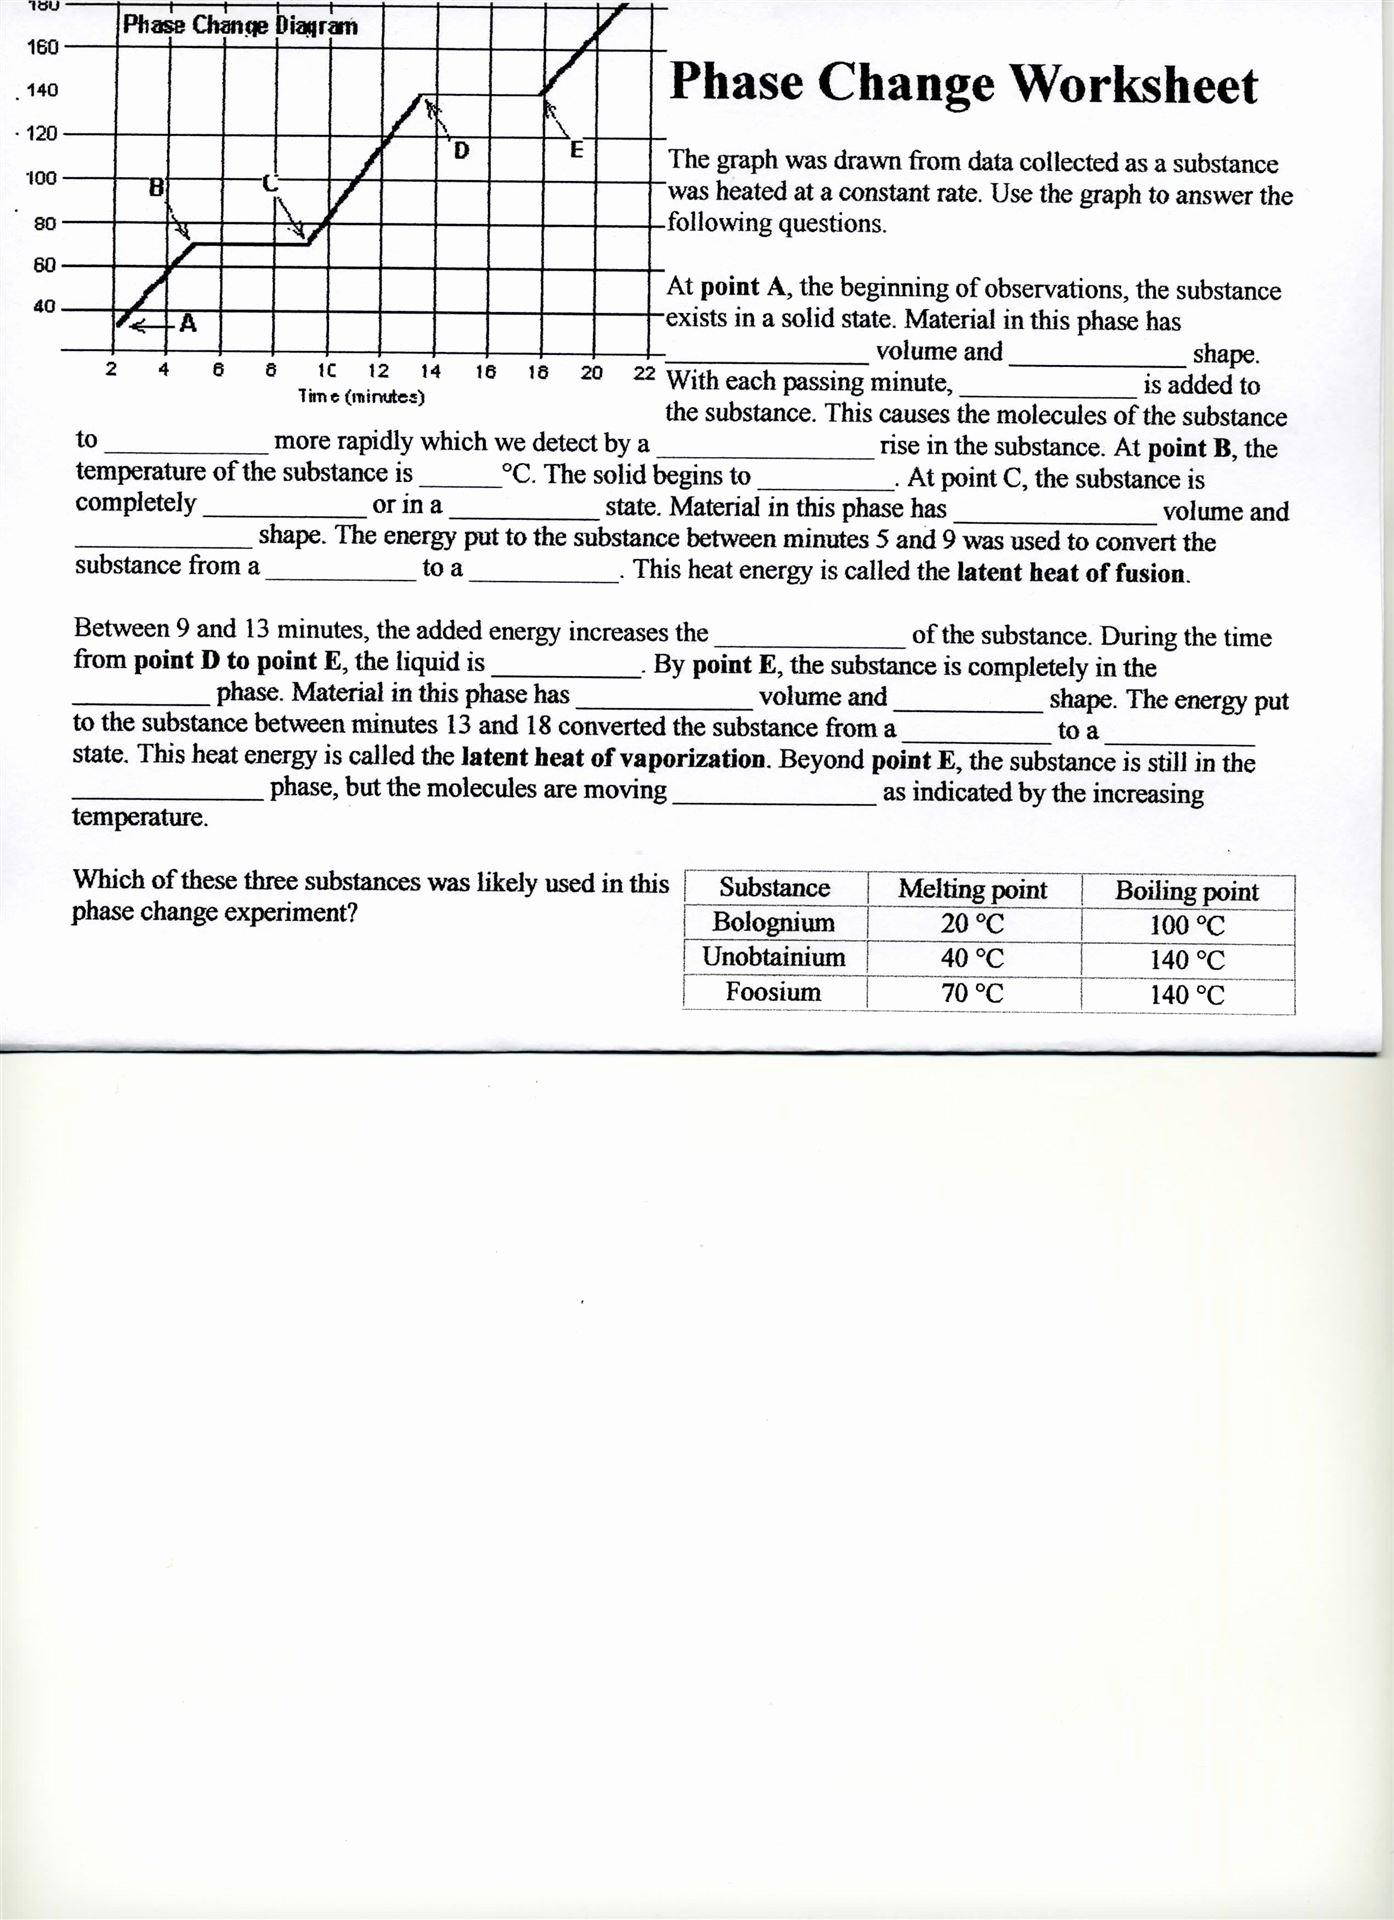 Phase Change Worksheet Answers Awesome Worksheet Phase Change Worksheet Answers Grass Fedjp